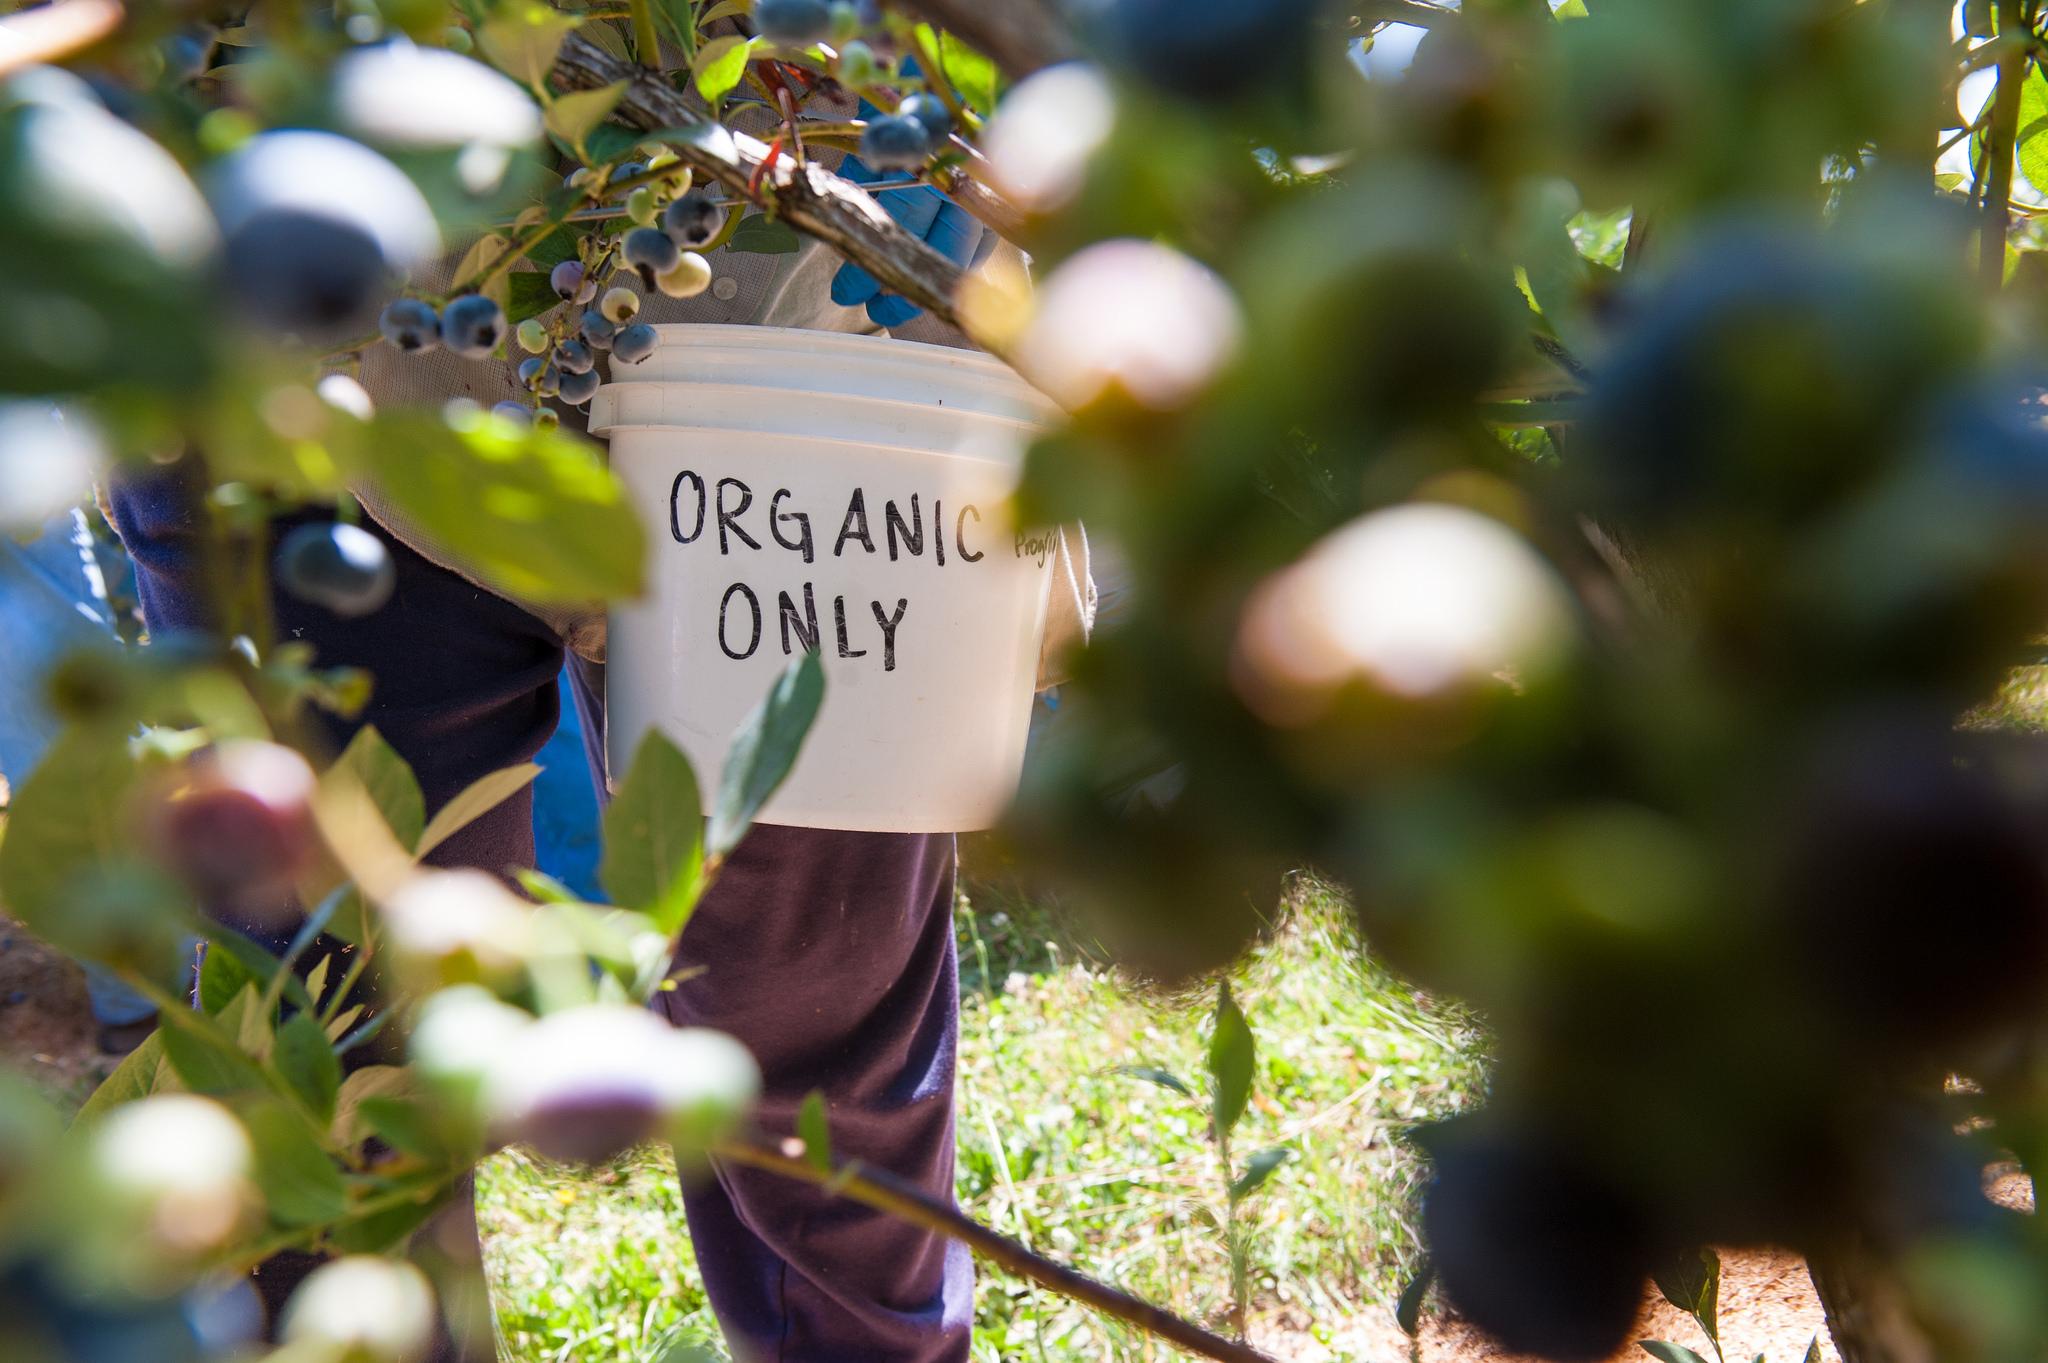 Nothing beats bug patrol for organic gardeners